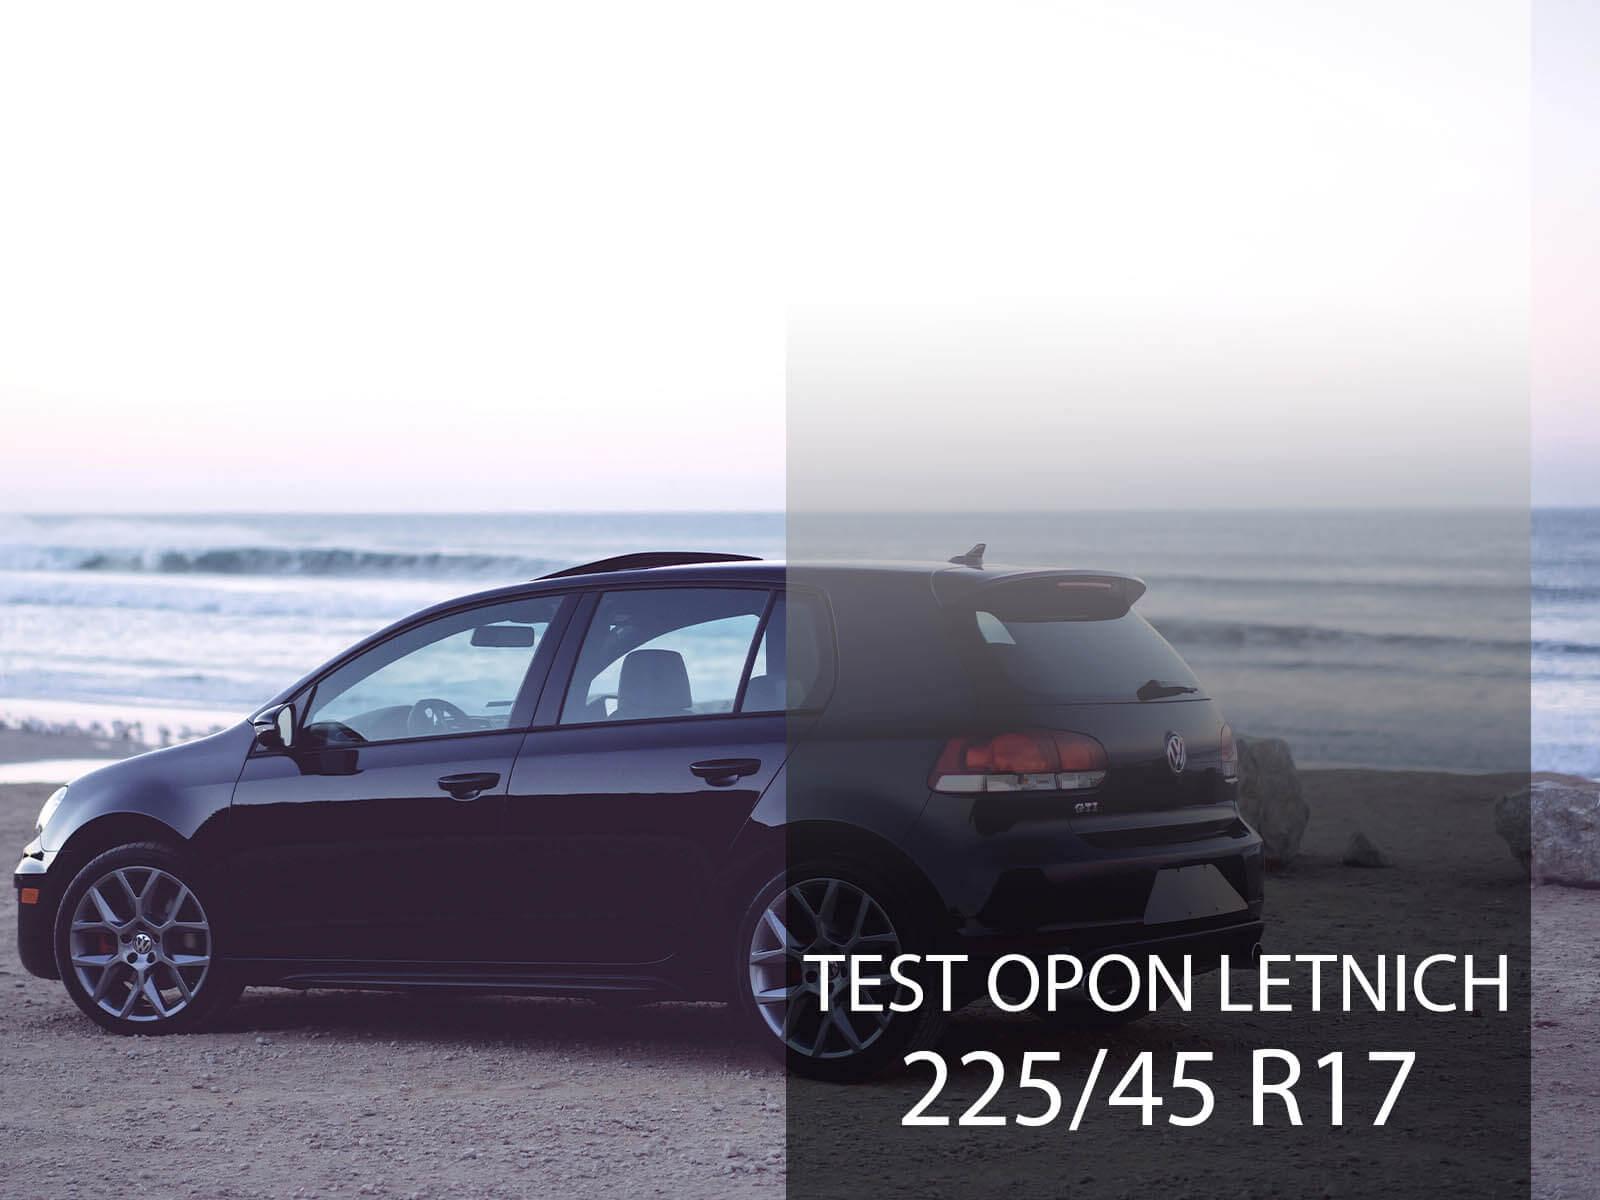 Test opon letnich 225/45 R17